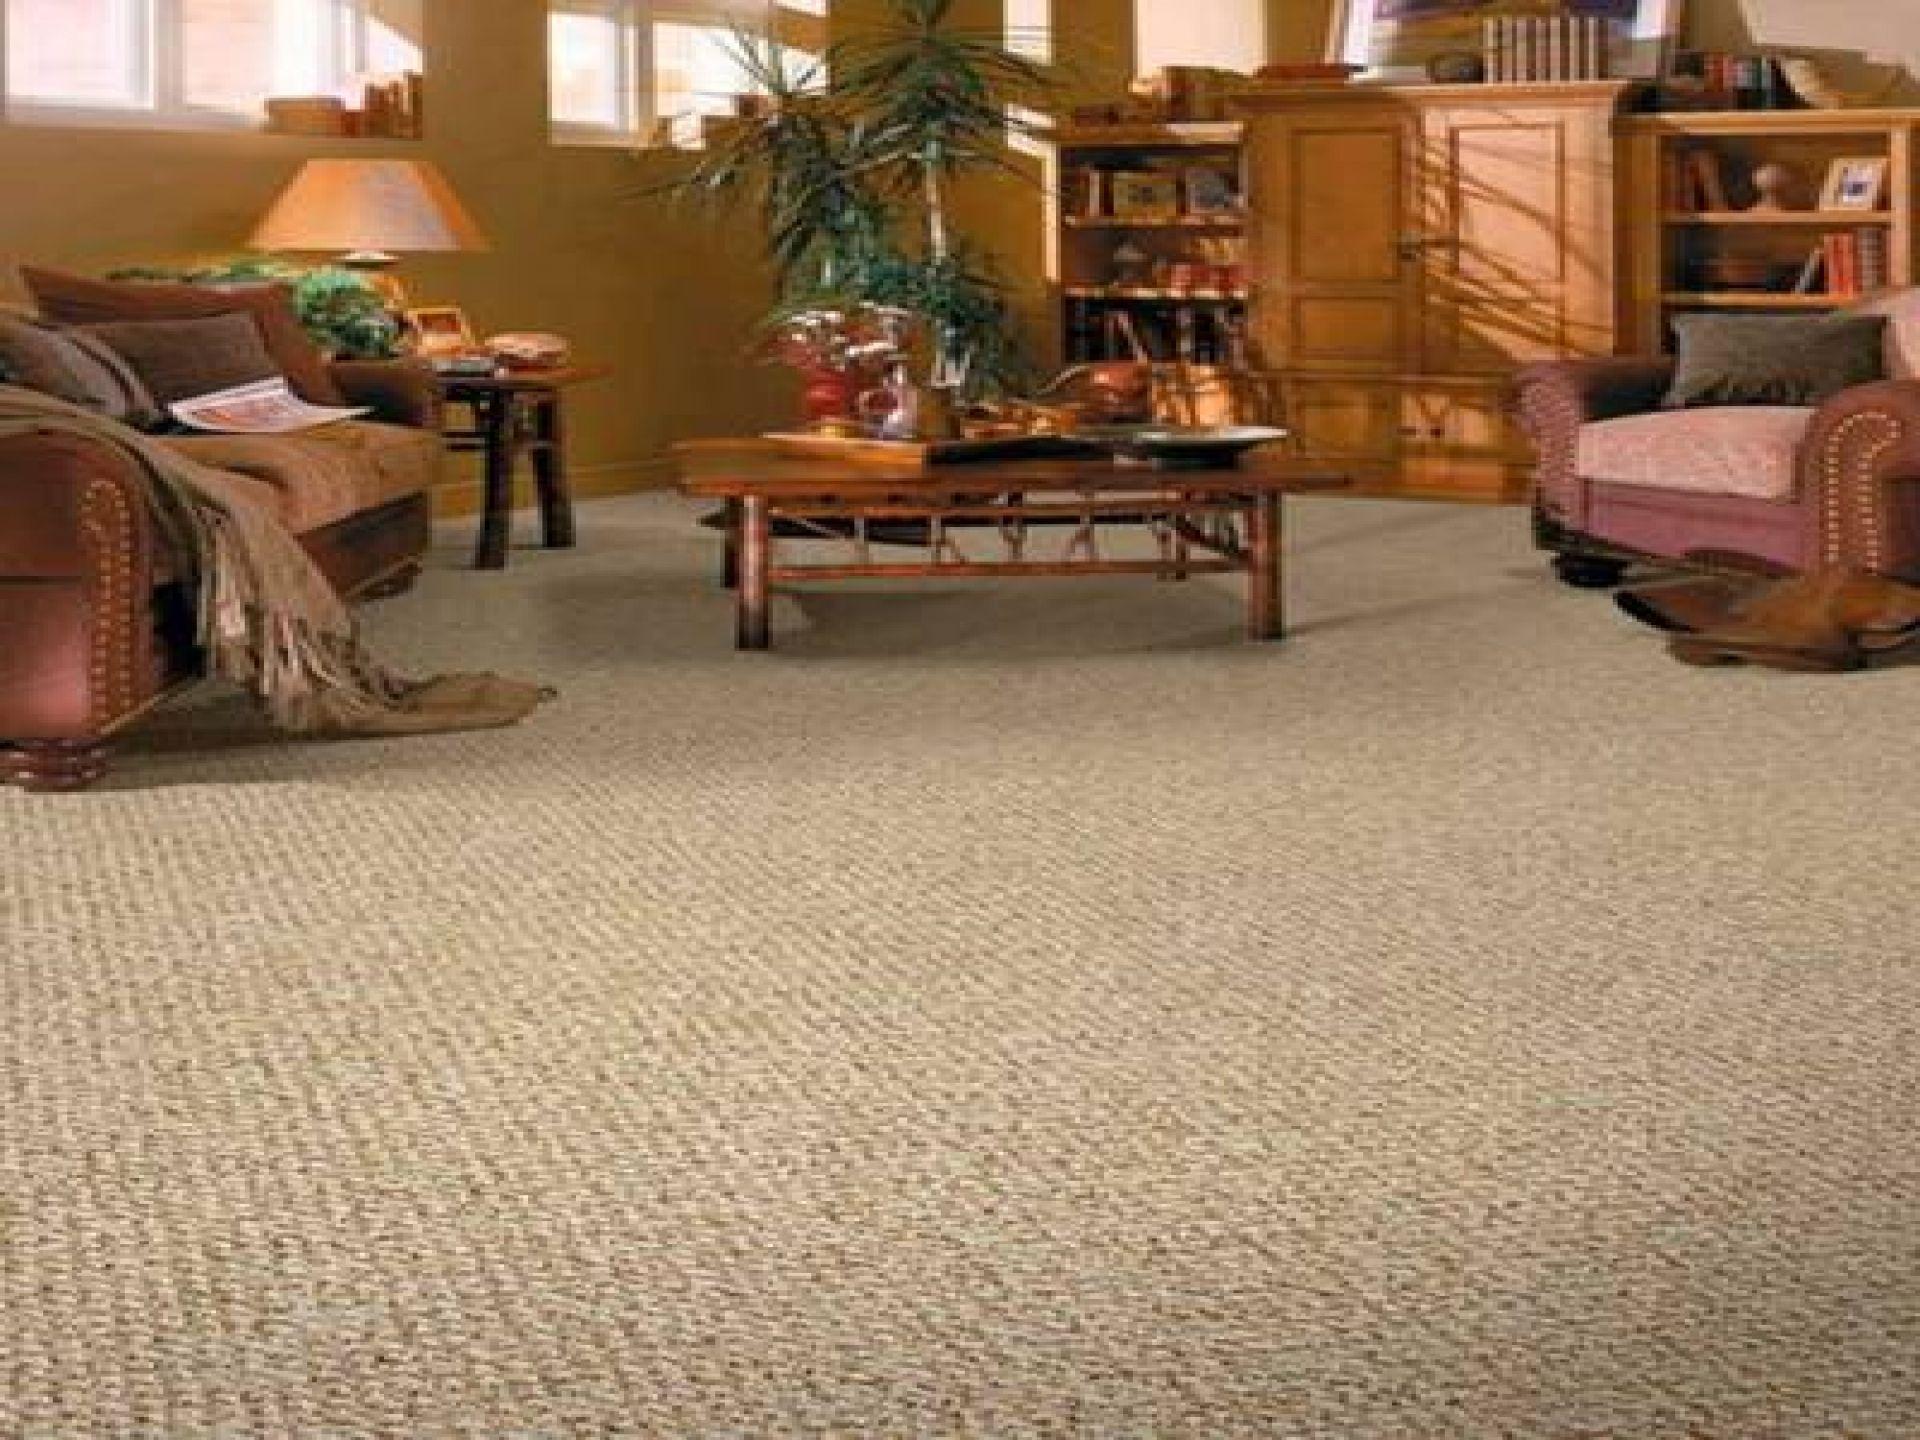 27 Dorable Living Room Carpet Living Room Carpet Choice For Your Home Rugs Furniture Inside Keyword Diningro Berber Carpet Carpet Design Living Room Carpet Carpet on carpet living room